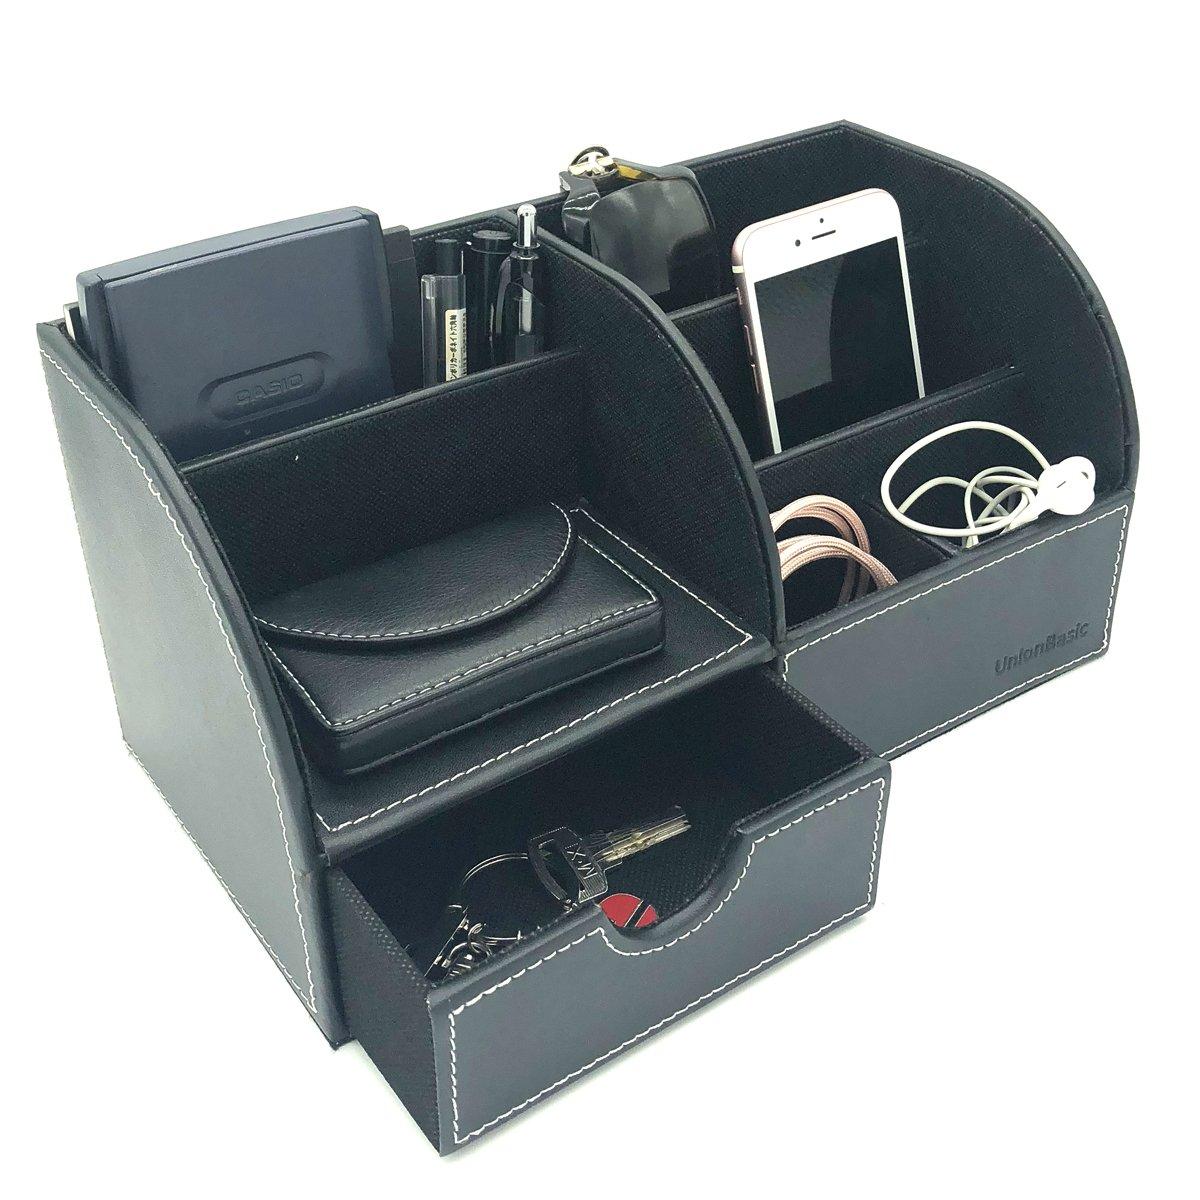 UnionBasic Office Desk Organizer - Multifunctional PU Leather Desktop Storage Box - Business Card/Pen/Pencil/Mobile Phone/Stationery Holder (Black)